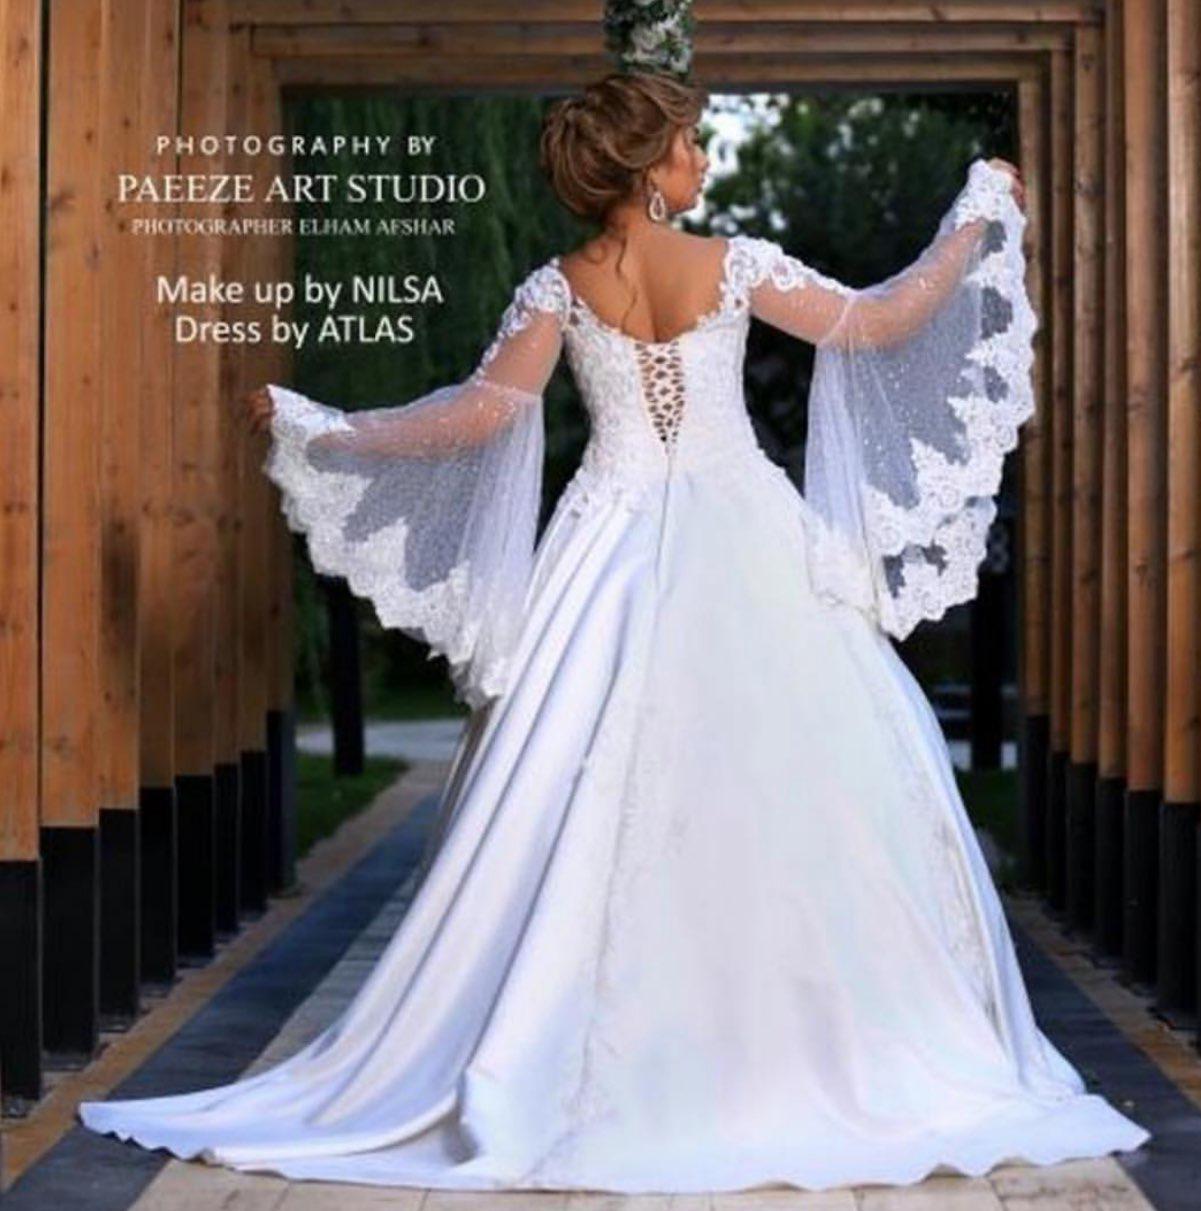 مزون لباس عروس اطلس در شهر قدس